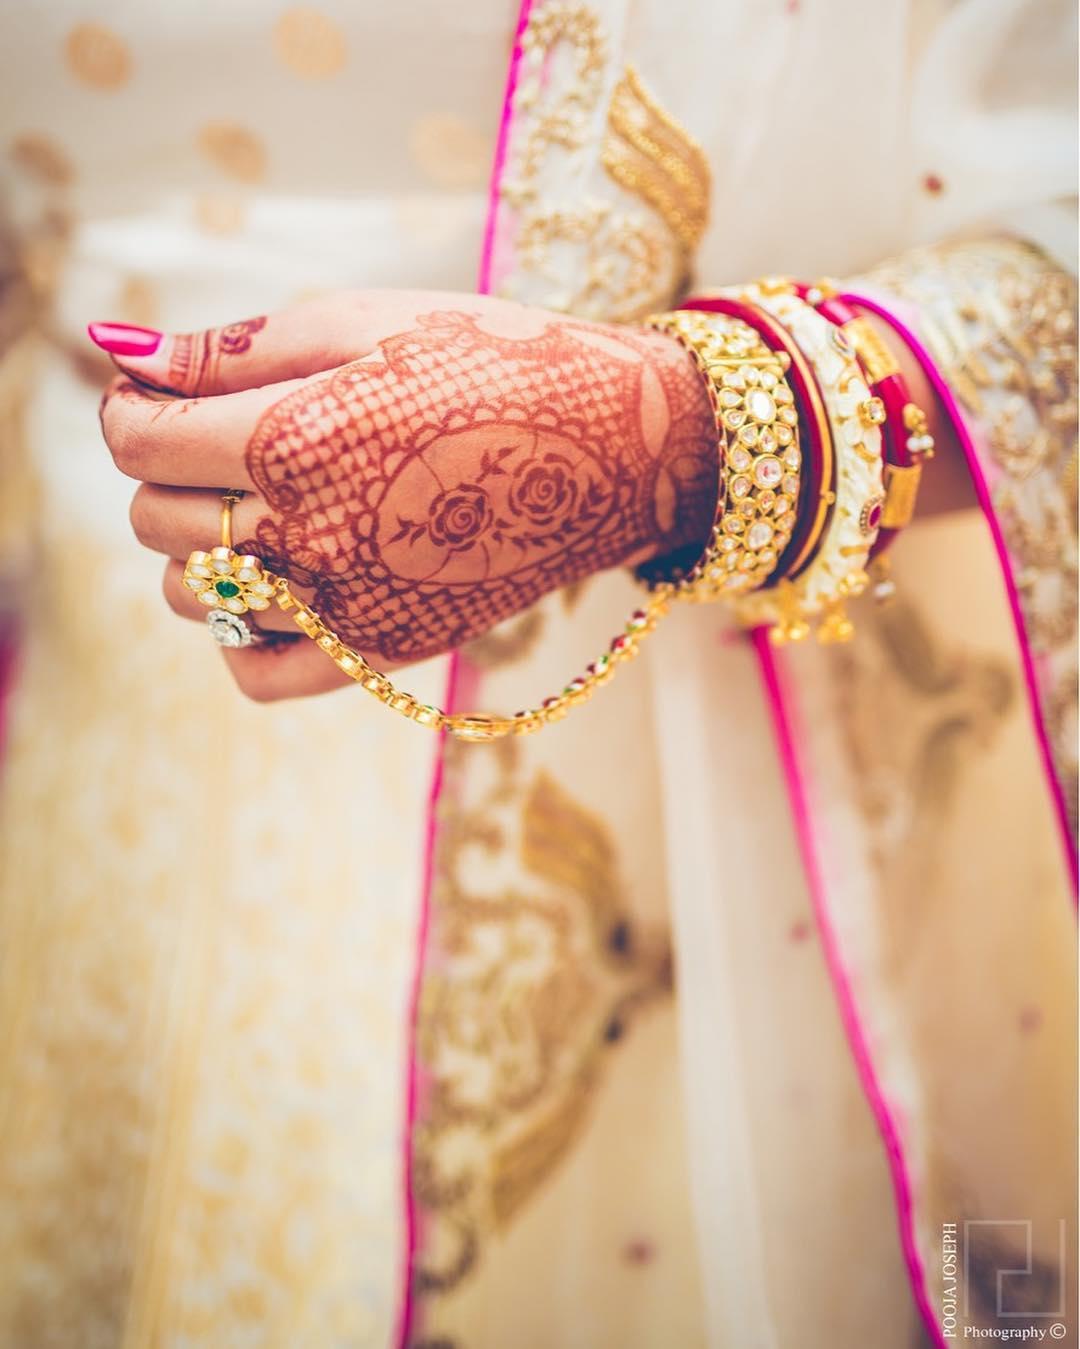 Mehandi designs for bridal hands- Jaali mehandi design for back hand side